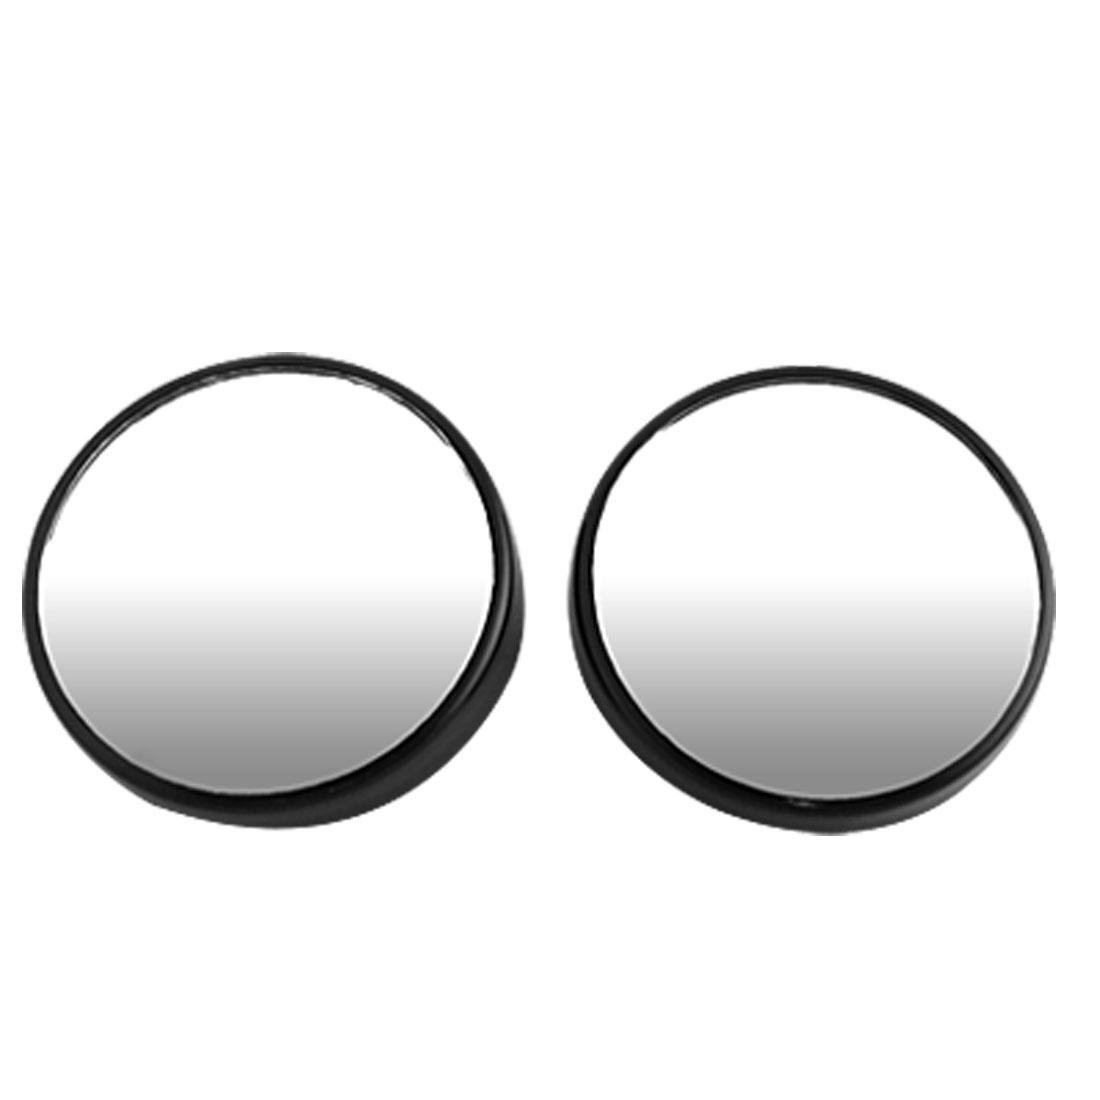 Unique Bargains Car 360 Degrees Adjustable Black Blind Spot Mirror 50mm